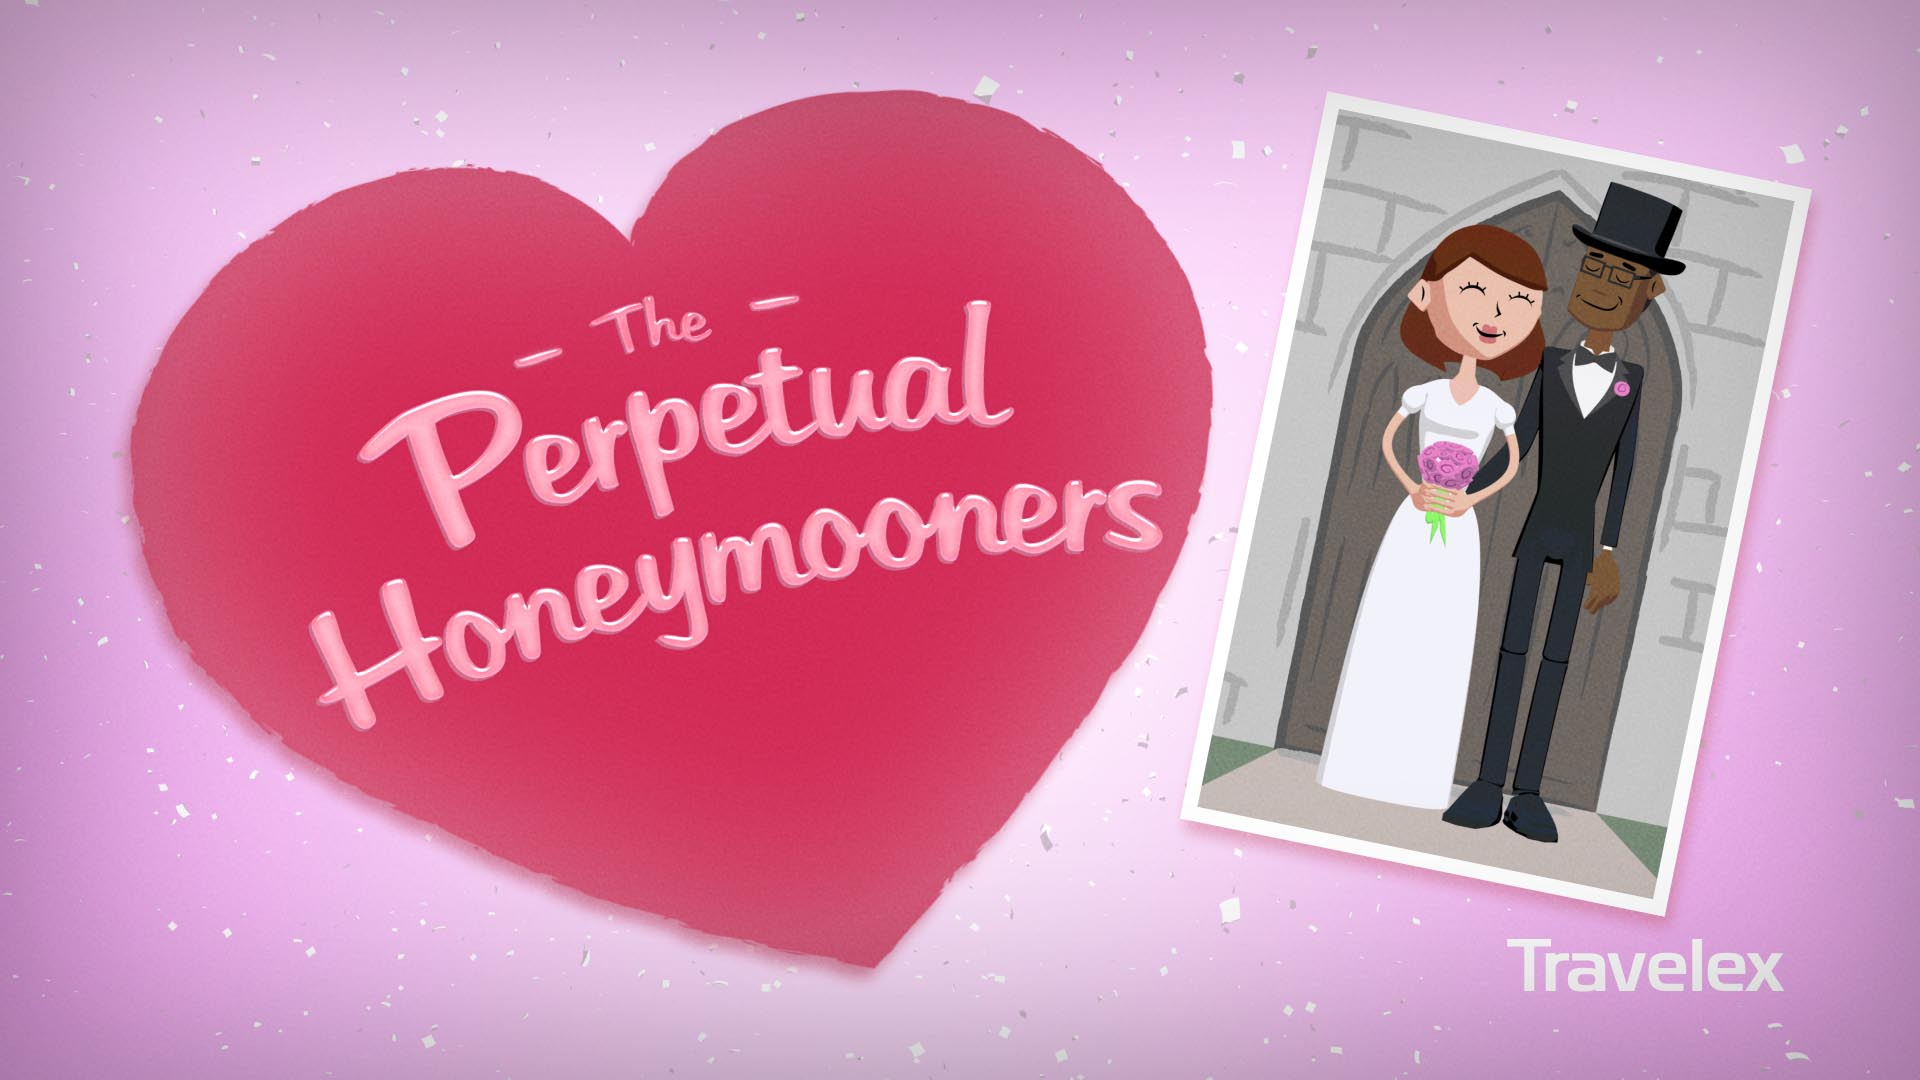 Travelex - The Perpetual Honeymooners - title.jpg